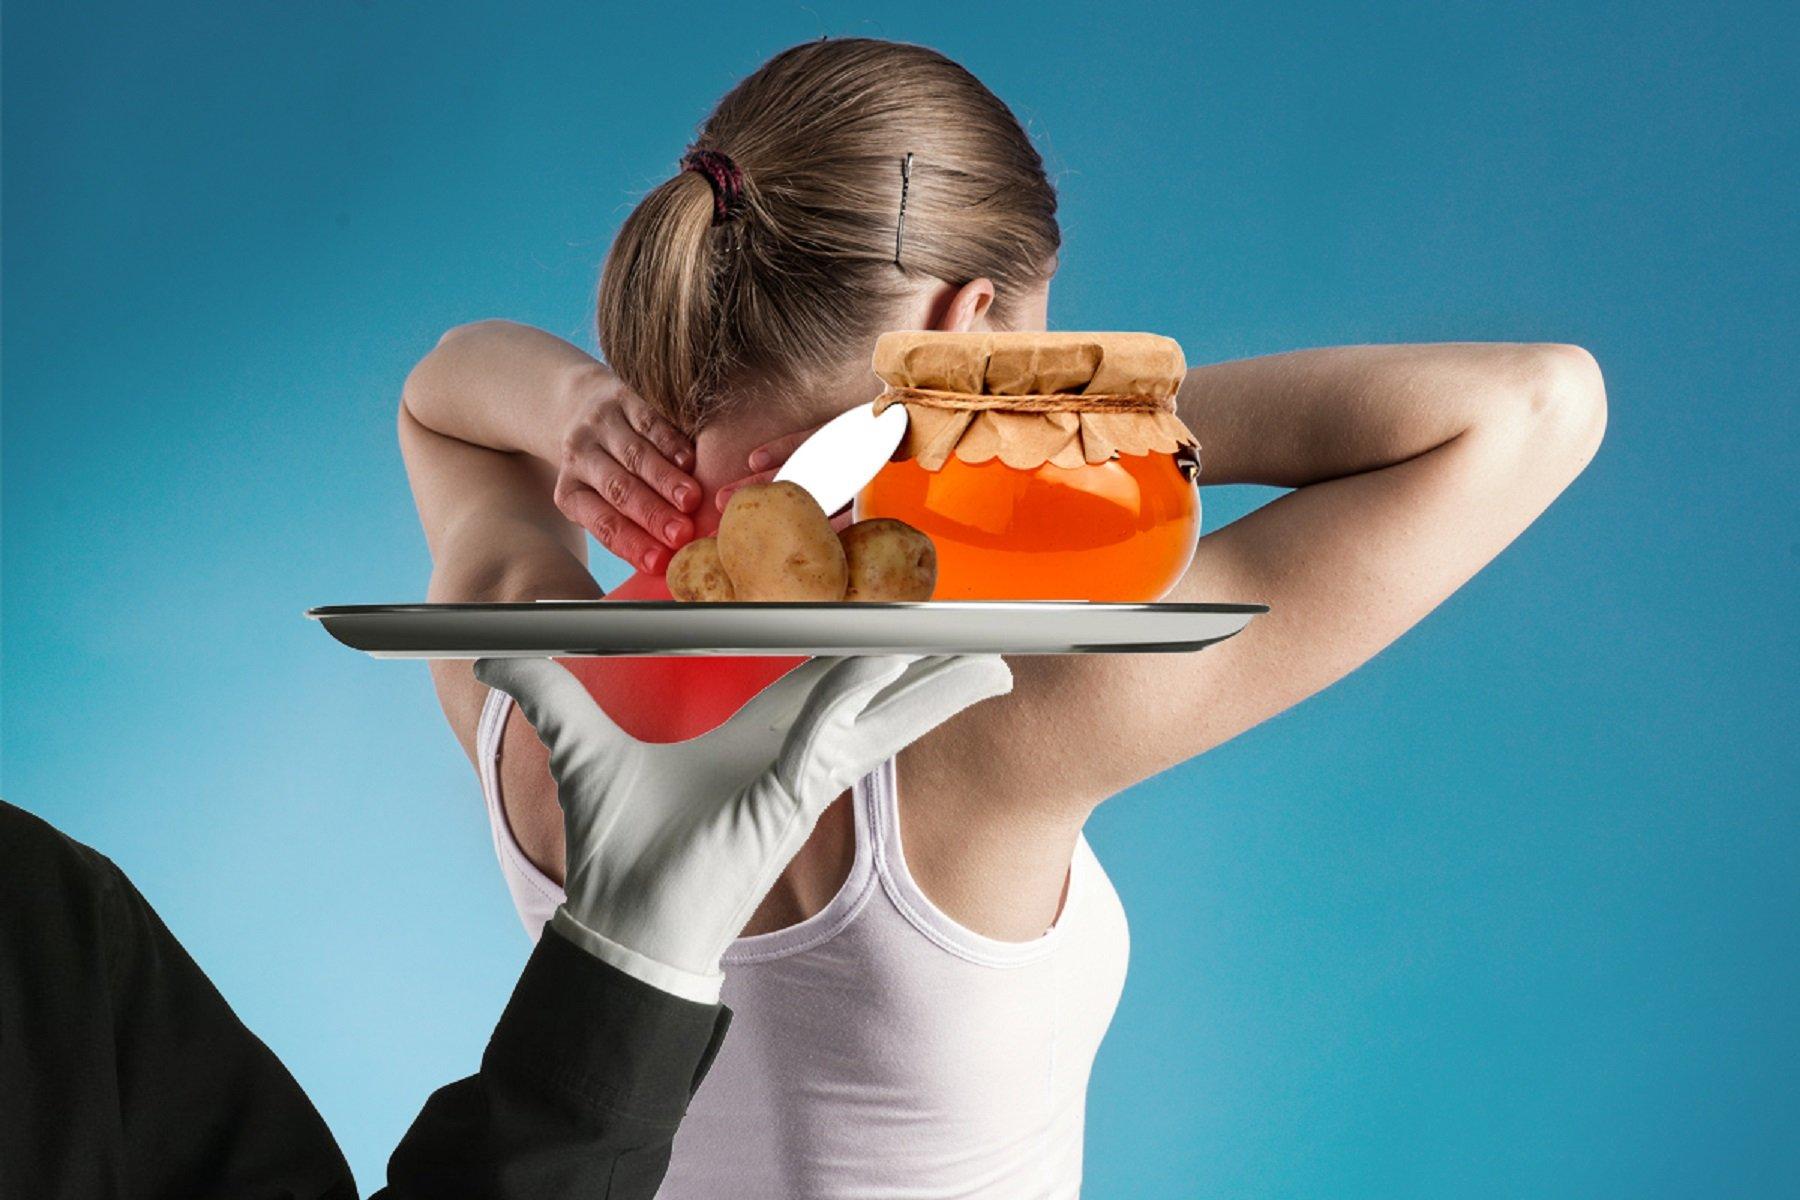 компресс из картошки и меда при остеохондрозе моему мнению